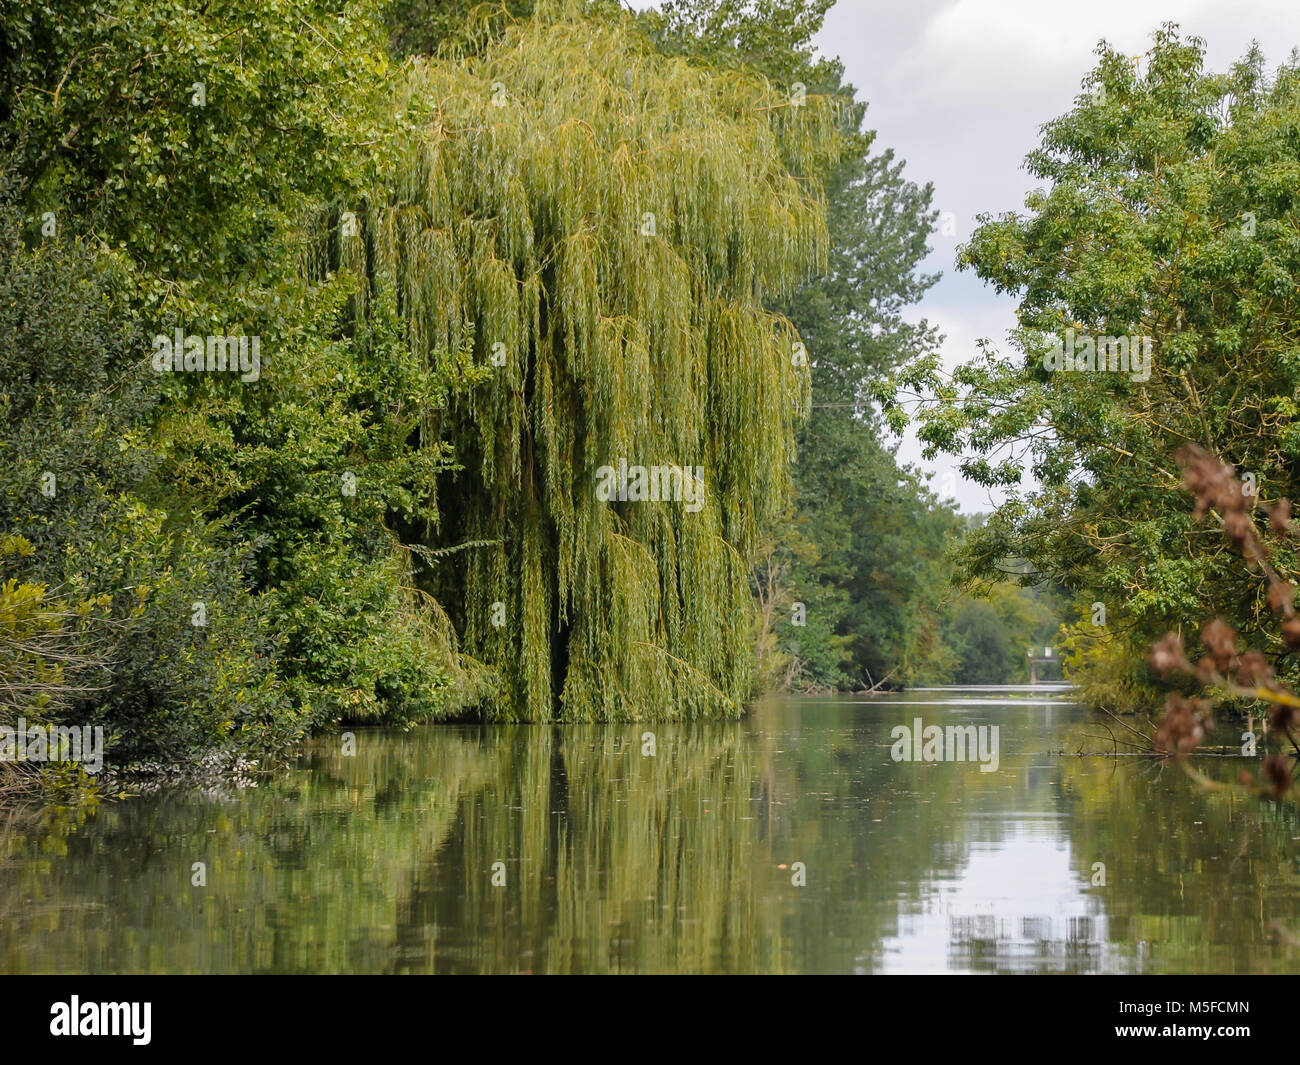 Marais Poitevin Regional Natural Park